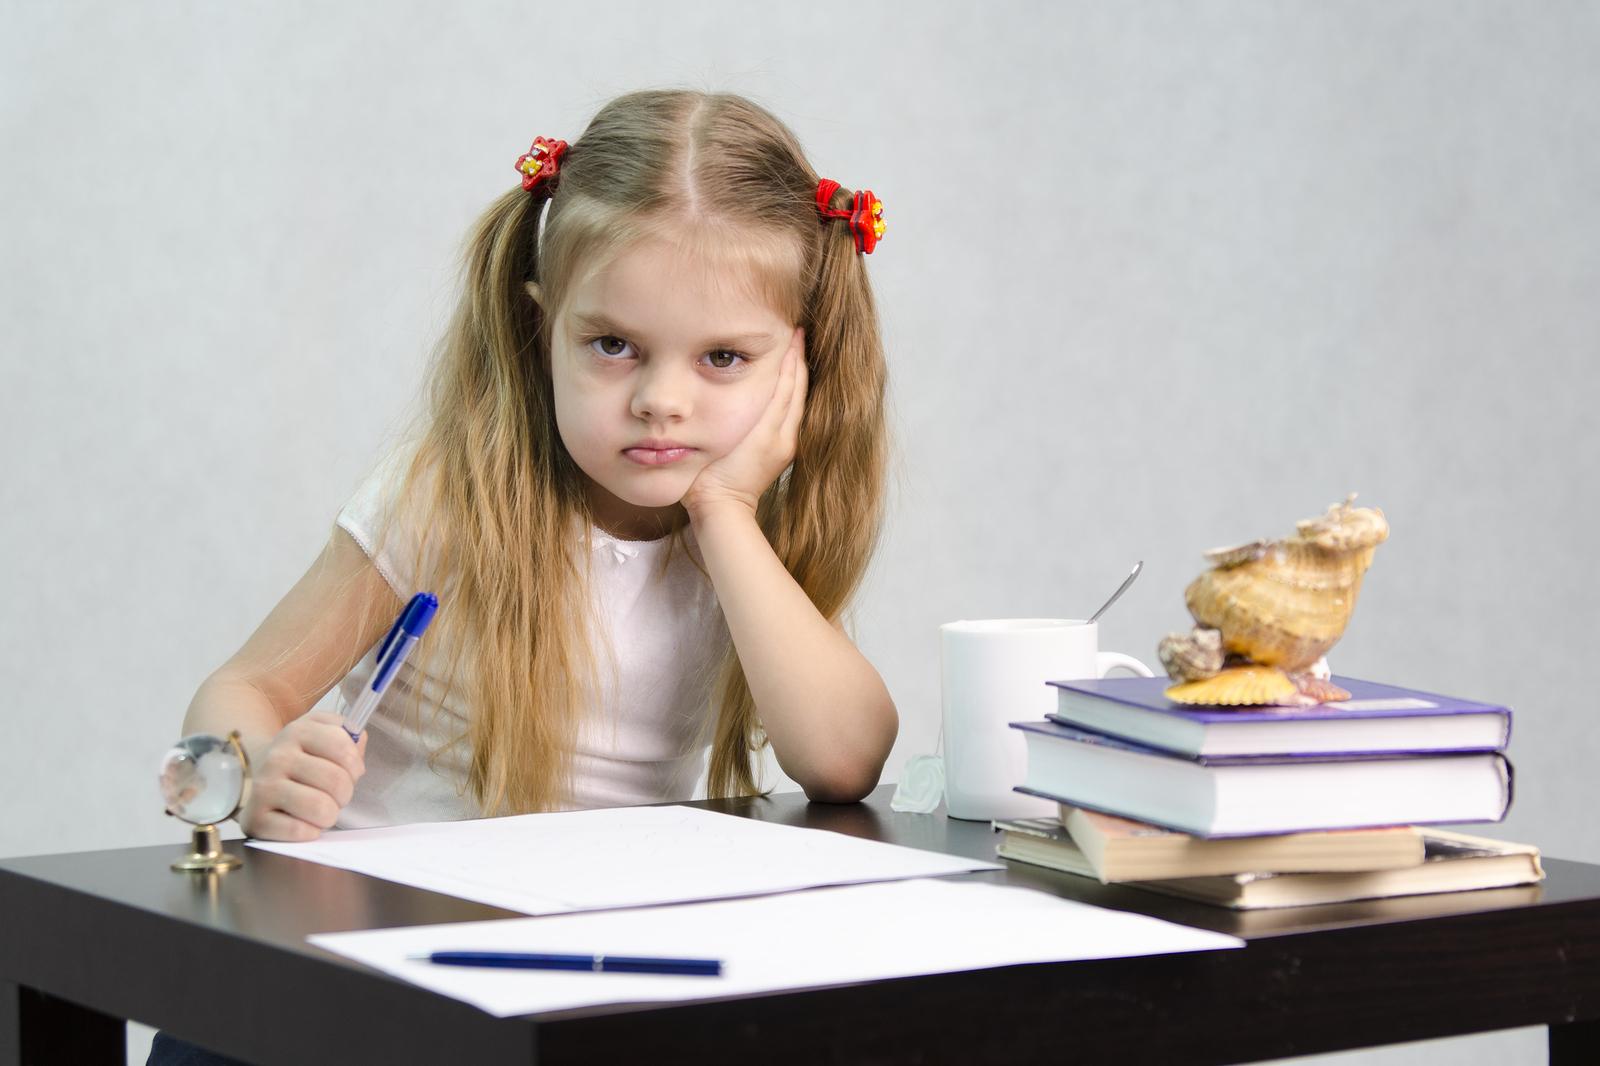 Home Care Sandusky OH - How You Can Keep a Medically Fragile Child Healthier at School